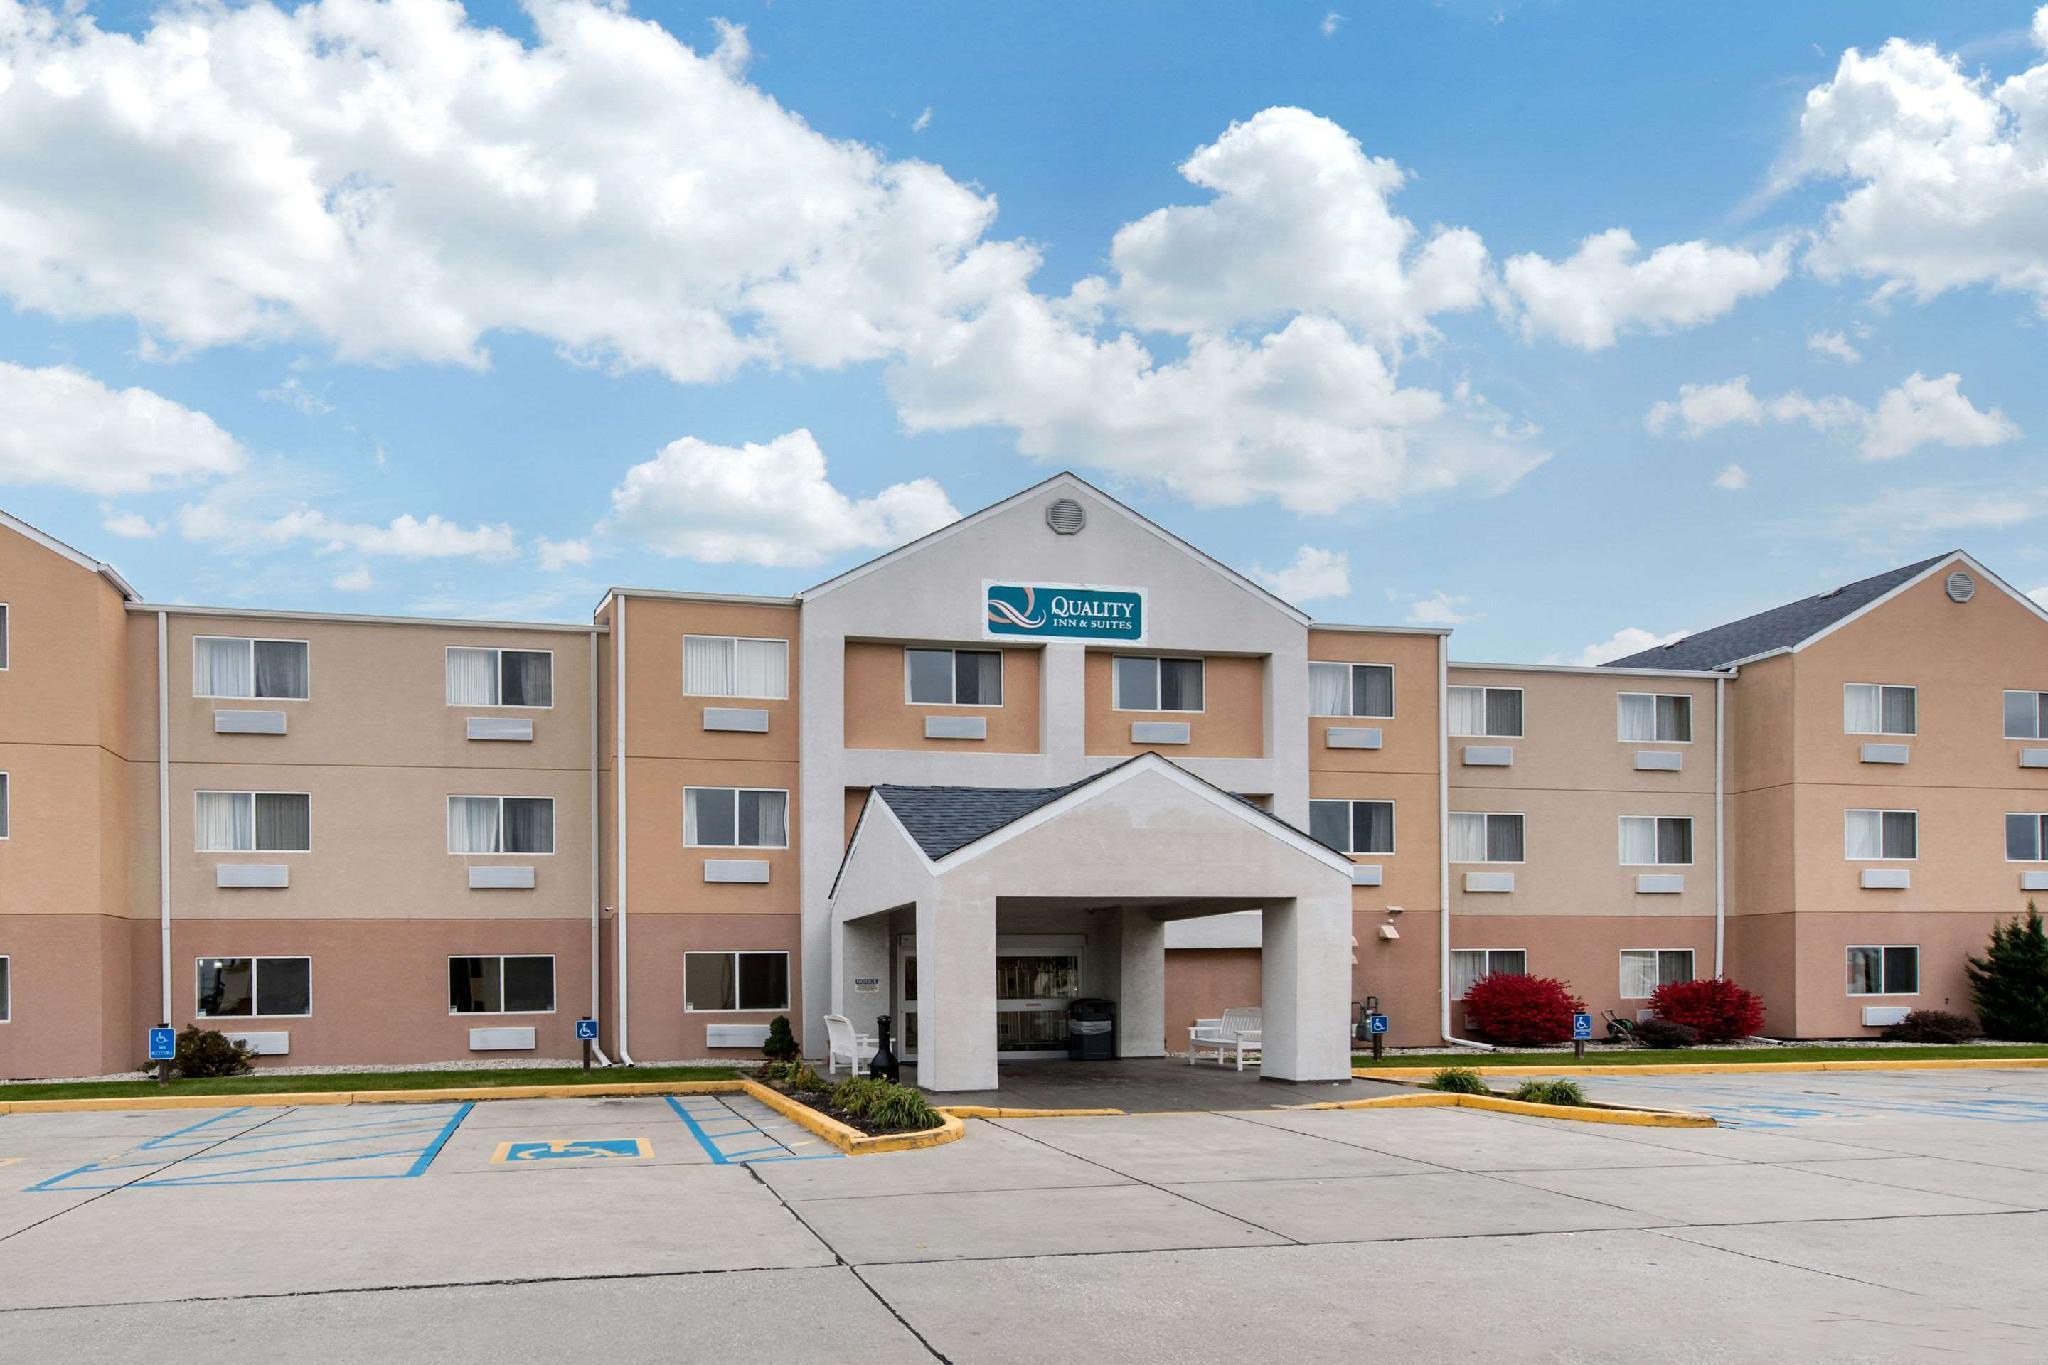 Quality Inn And Suites Kokomo